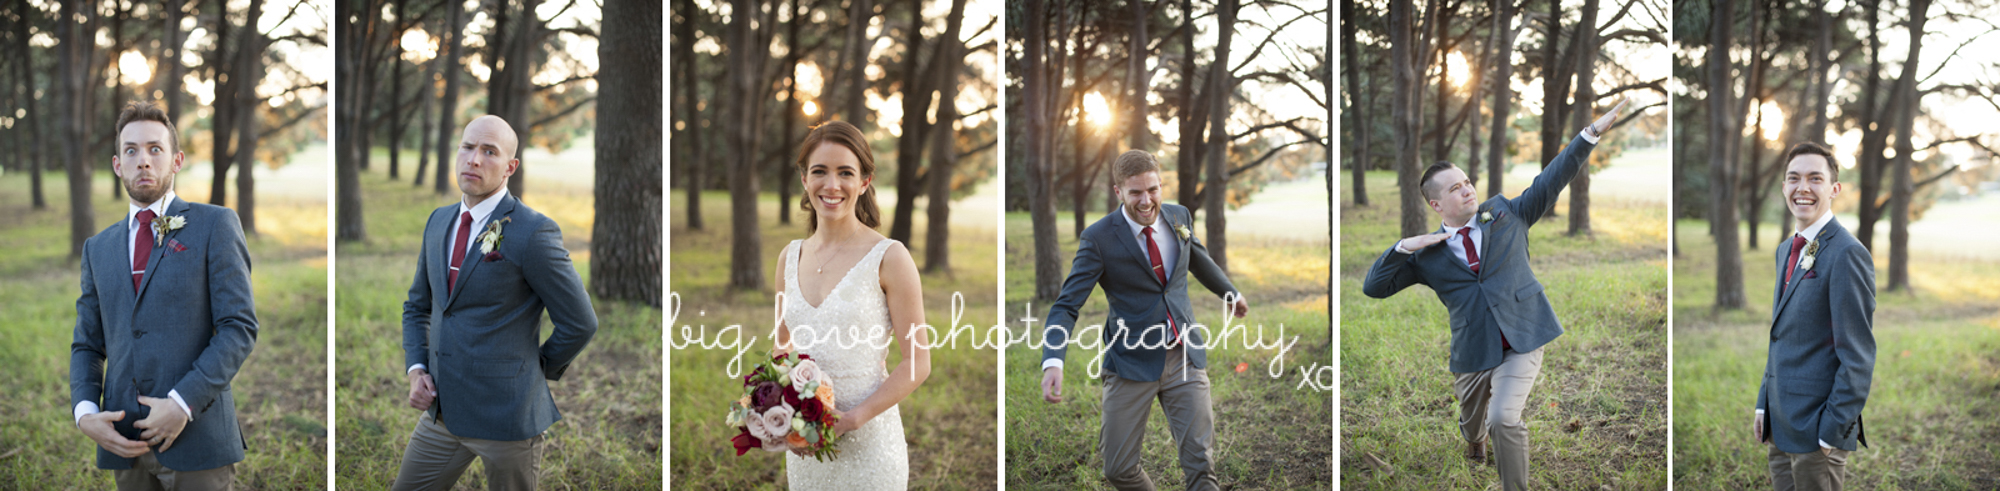 sydneyweddingphotography-4000.jpg